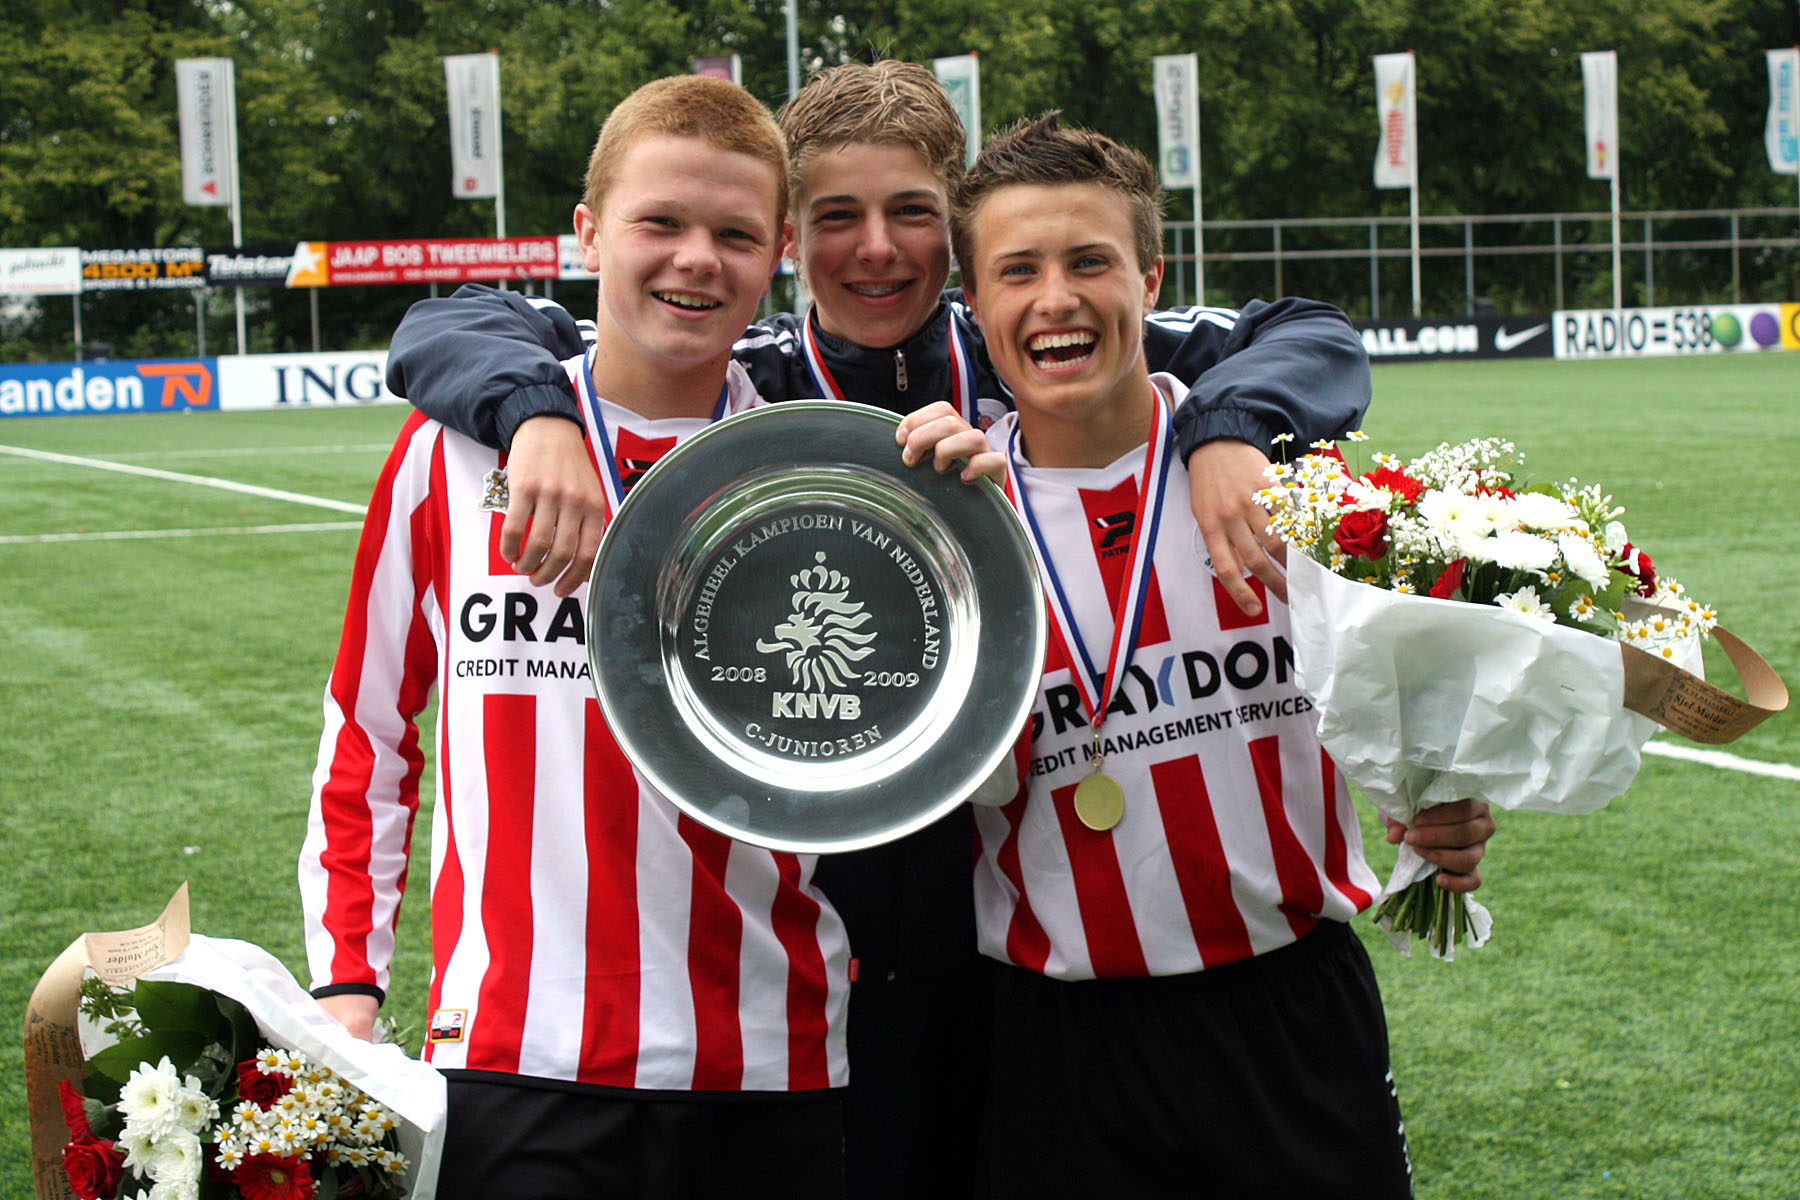 Pieter langedijk career stats height and weight age - Netherlands eerste divisie league table ...